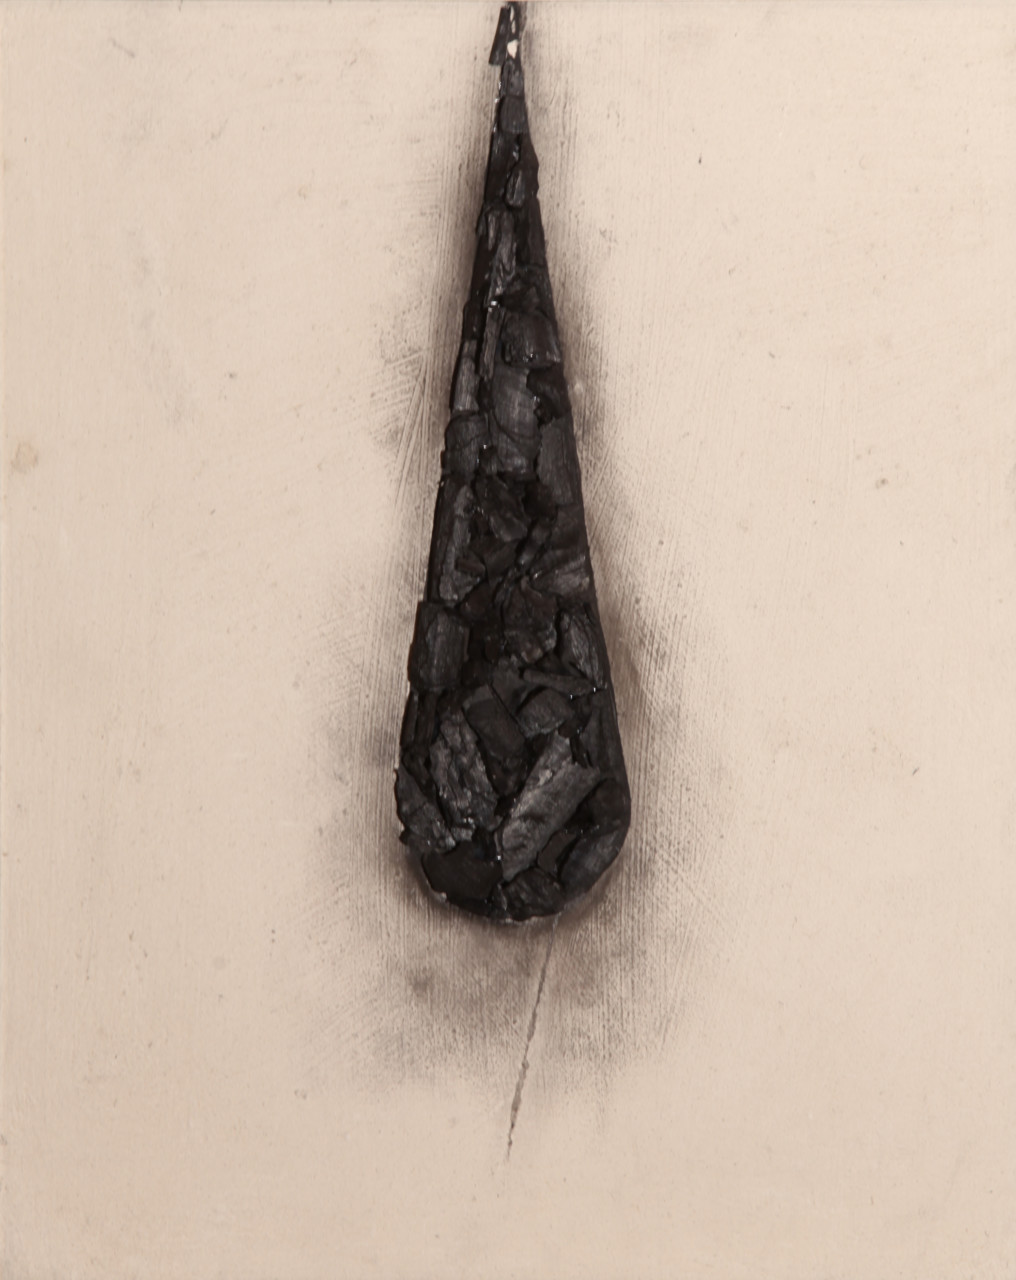 Drop, 2017, cenere e carbone su tela, 50x40